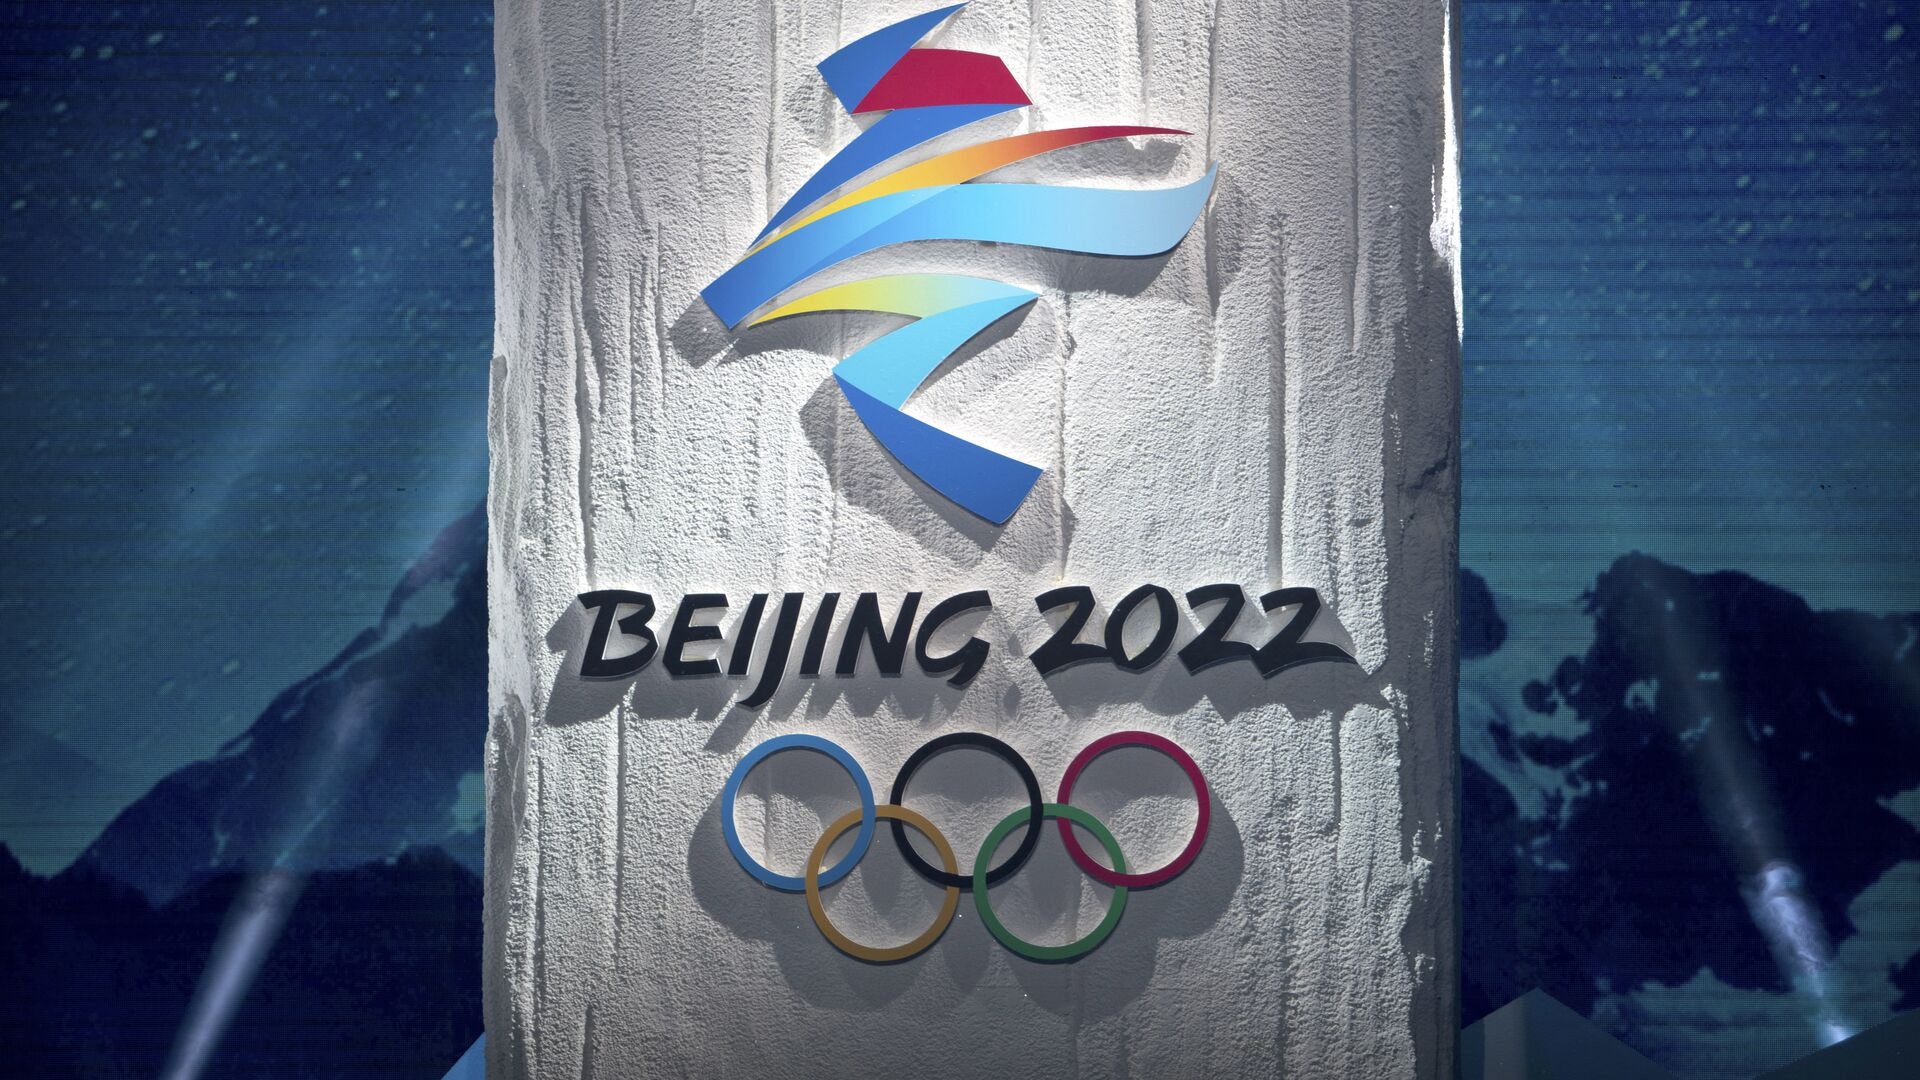 Logo de JJOO 2022 en Pekín - Sputnik Mundo, 1920, 29.09.2021